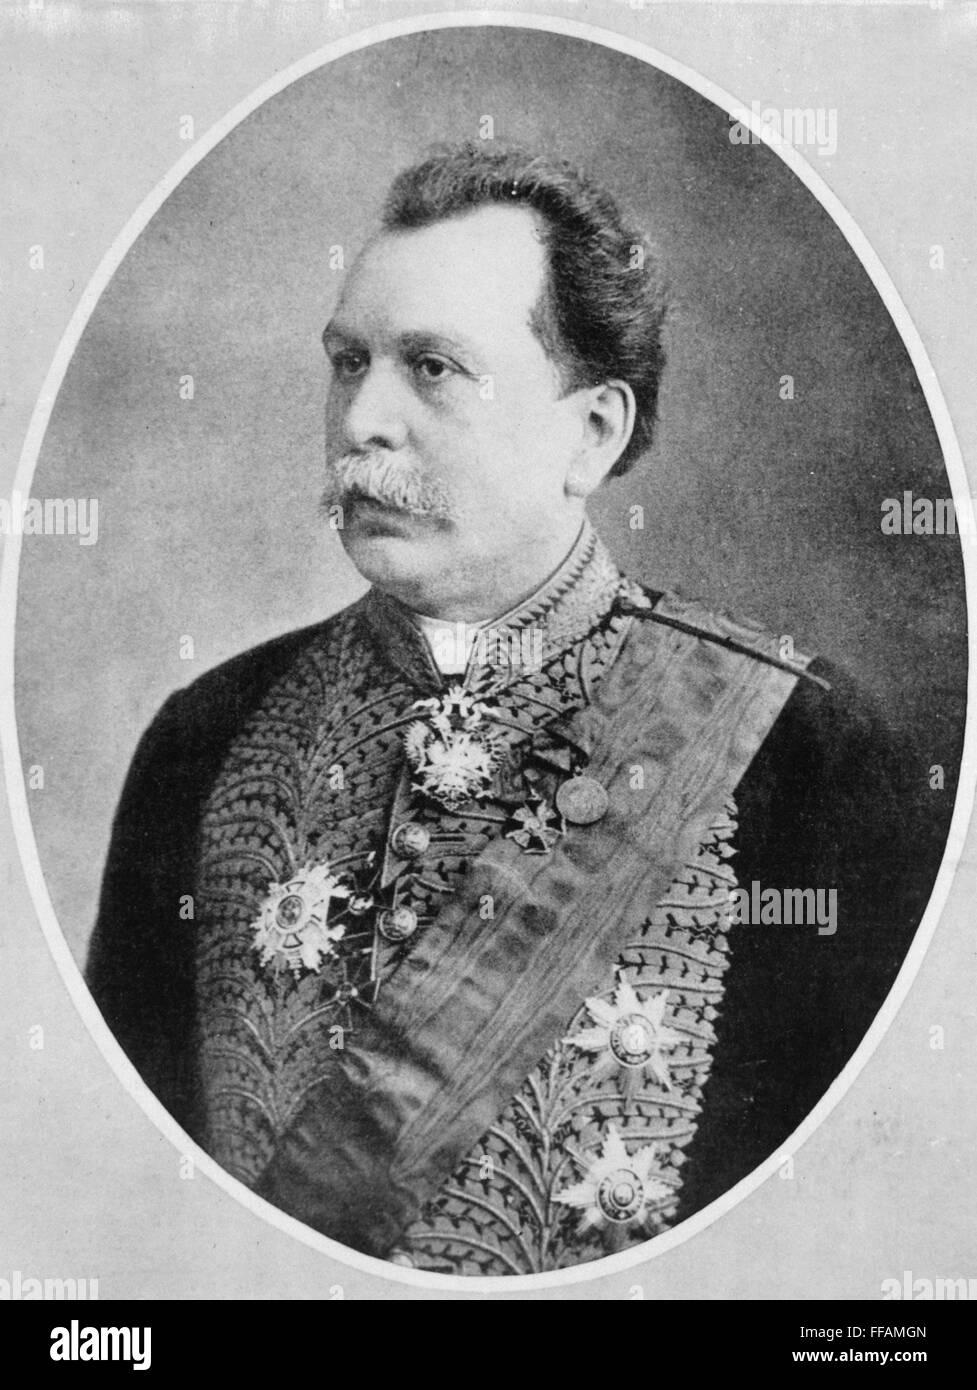 Pleve Vyacheslav Konstantinovich: biography 1